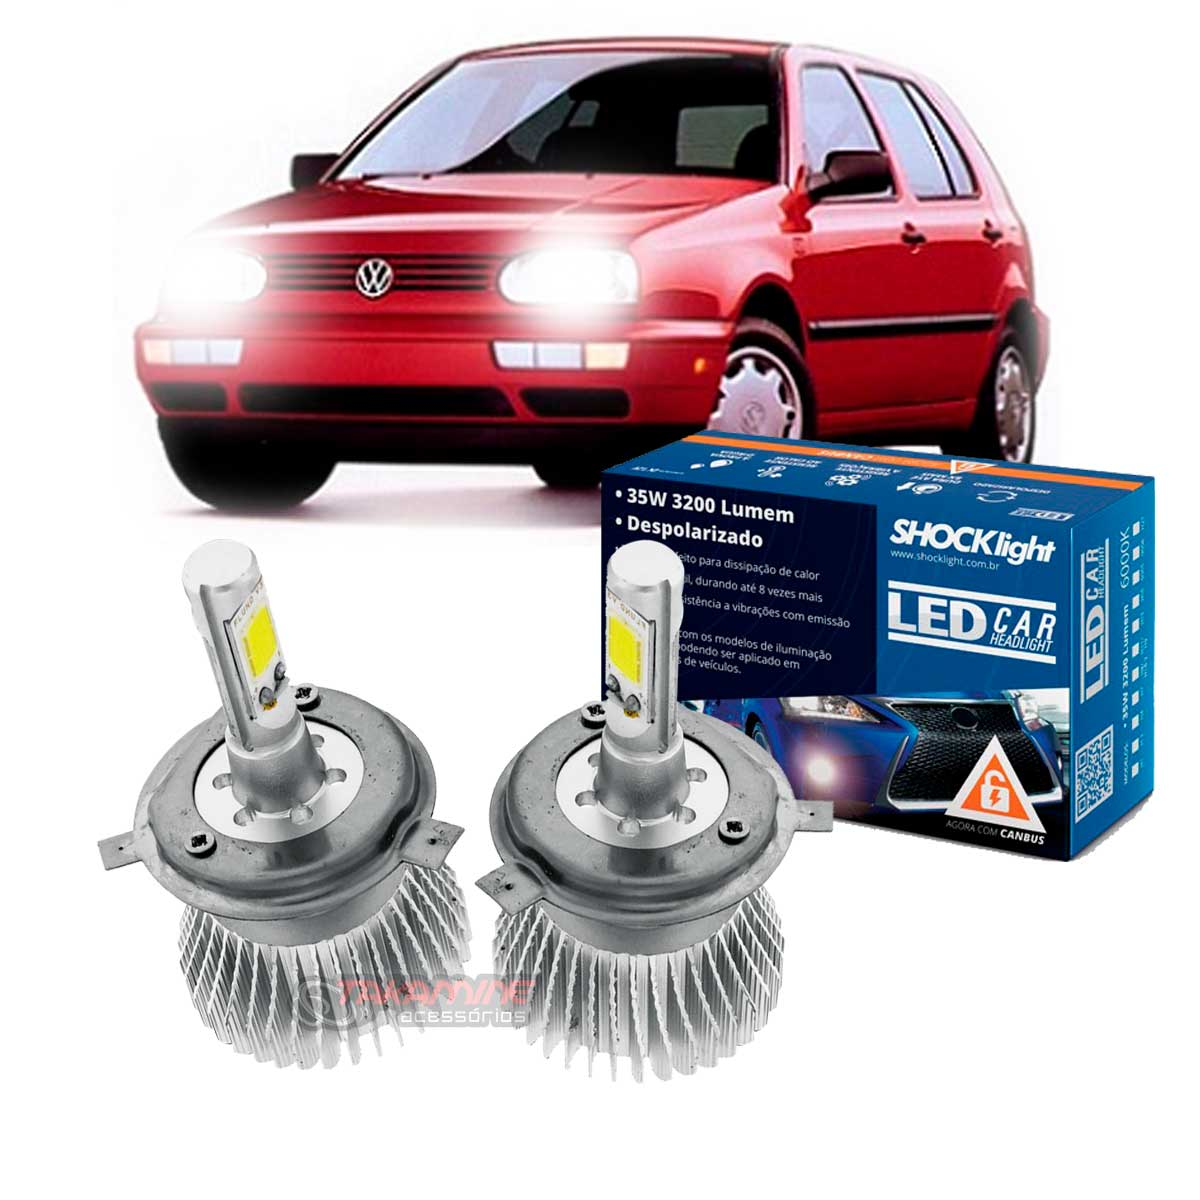 Kit LED Golf 1993 1994 1995 1996 1997 farol simples tipo xenon farol alto e baixo H4 35/35W Headlight